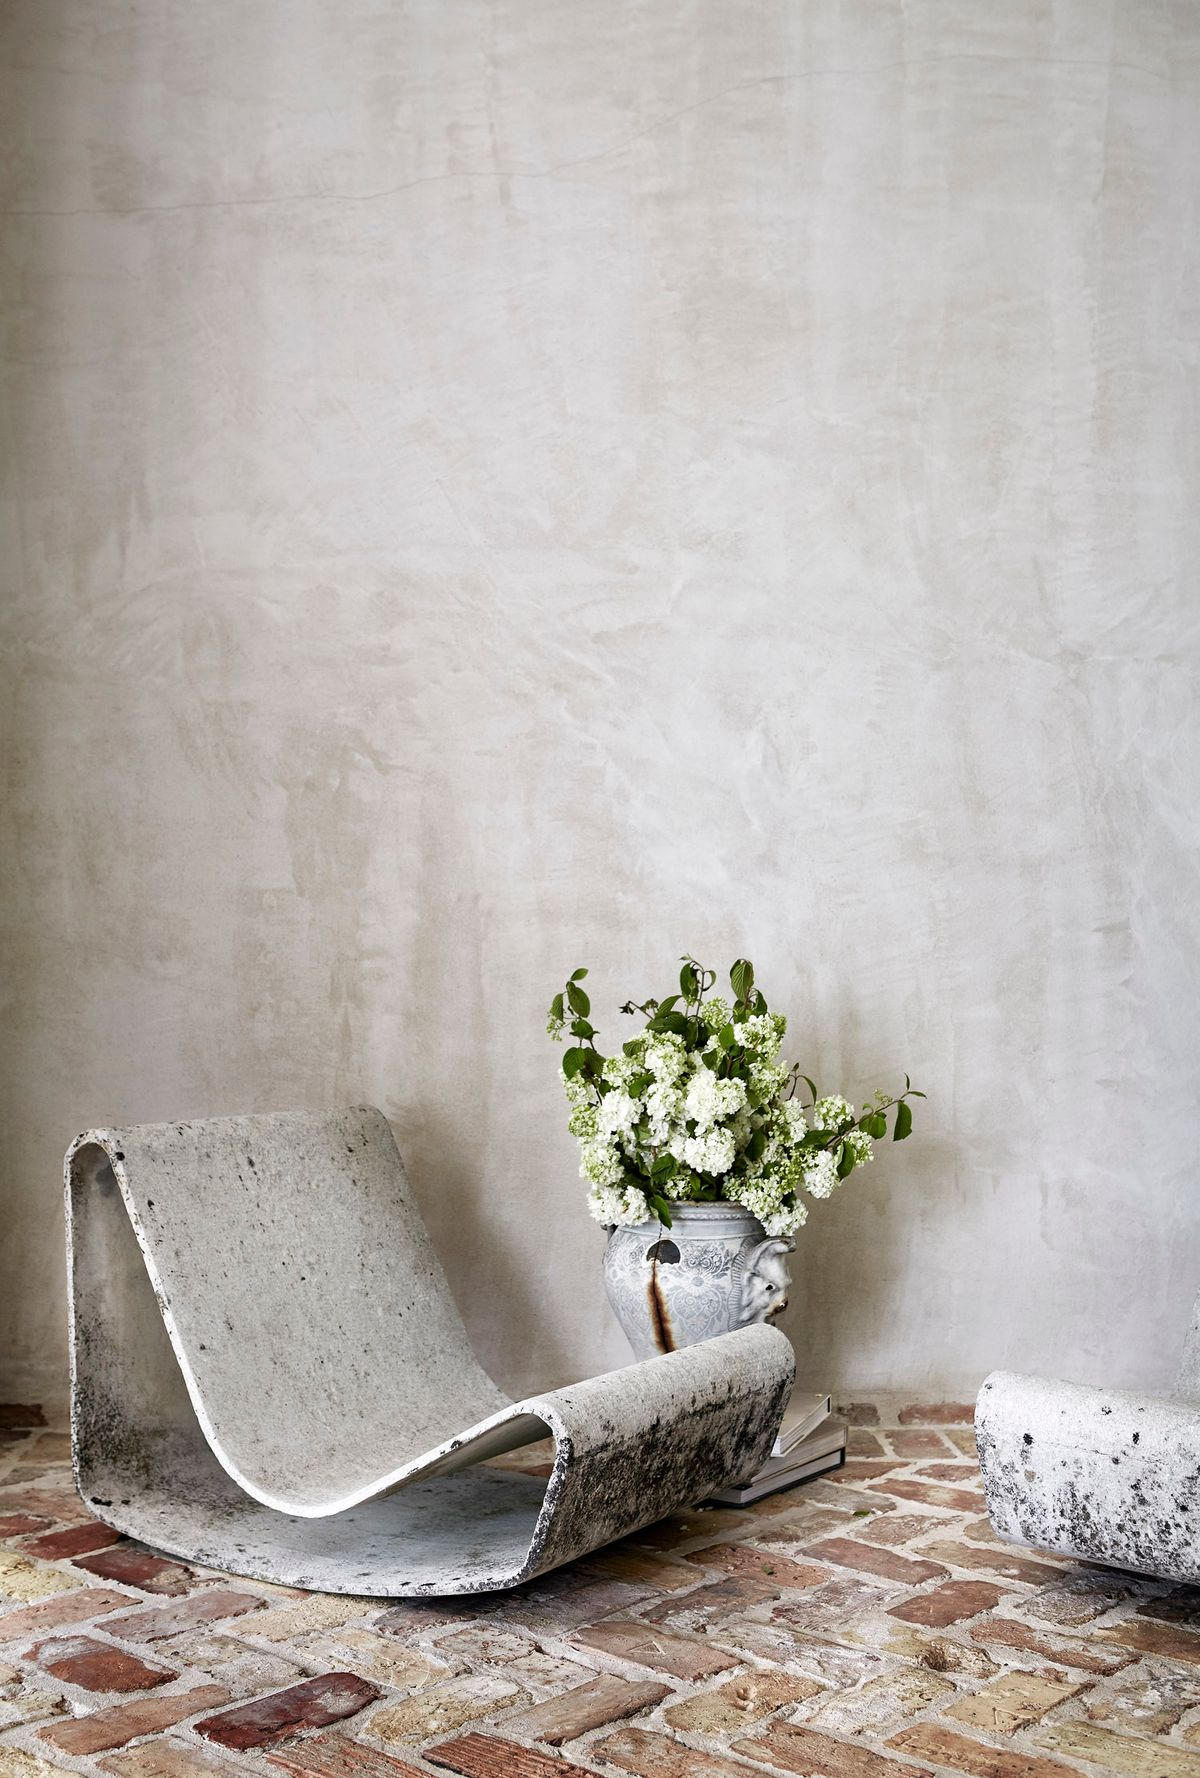 Pär Bengtsson Home Interior Editorial Photography21.jpg